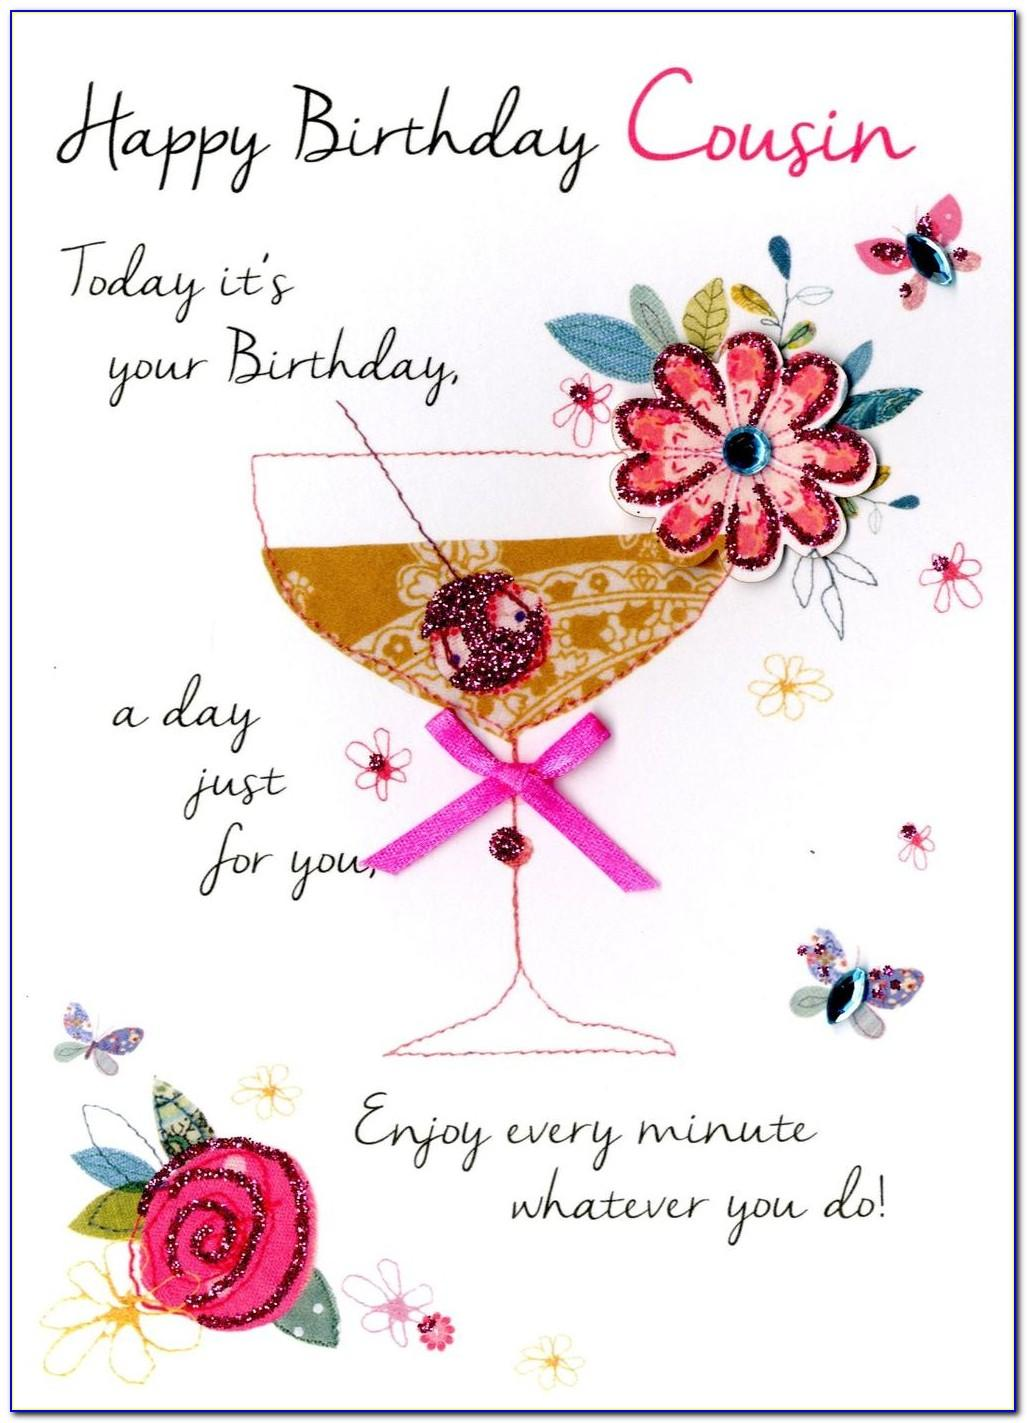 Cousin Birthday Card Verses